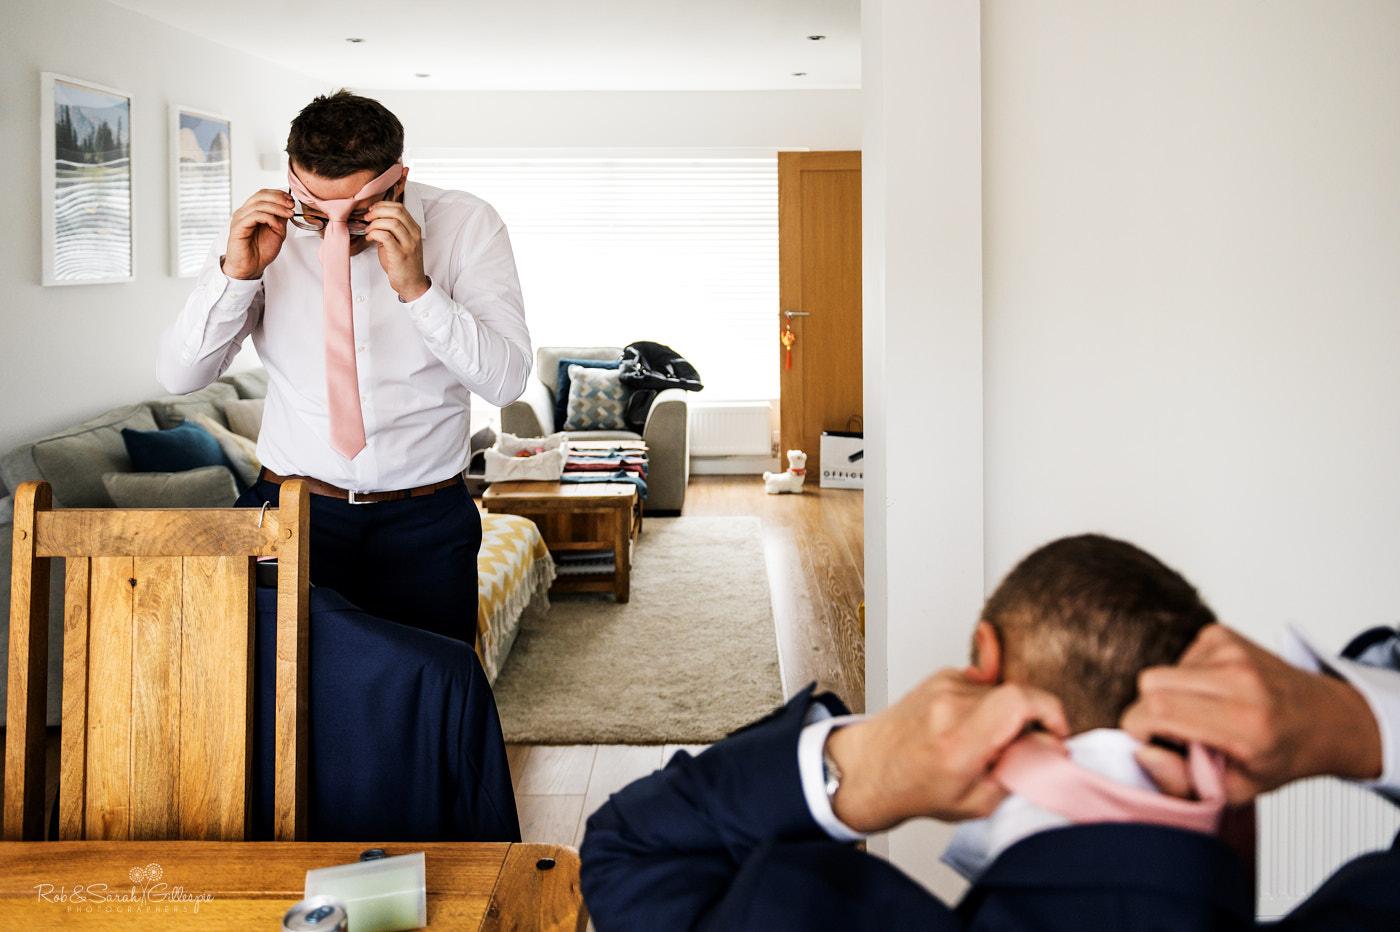 Groomsmen fix ties as they prepare for wedding